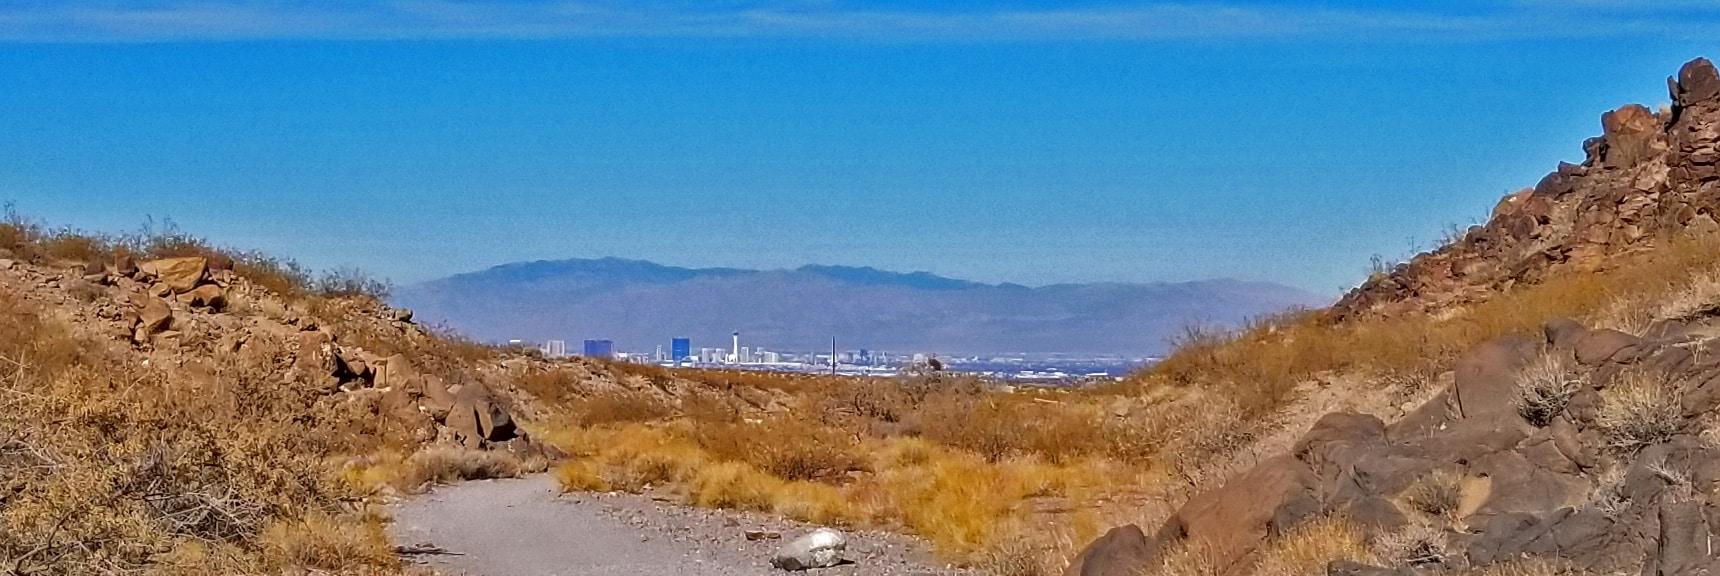 Las Vegas Strip Viewed from Lower Petroglyph Canyon | Petroglyph Canyon | Sloan Canyon National Conservation Area, Nevada